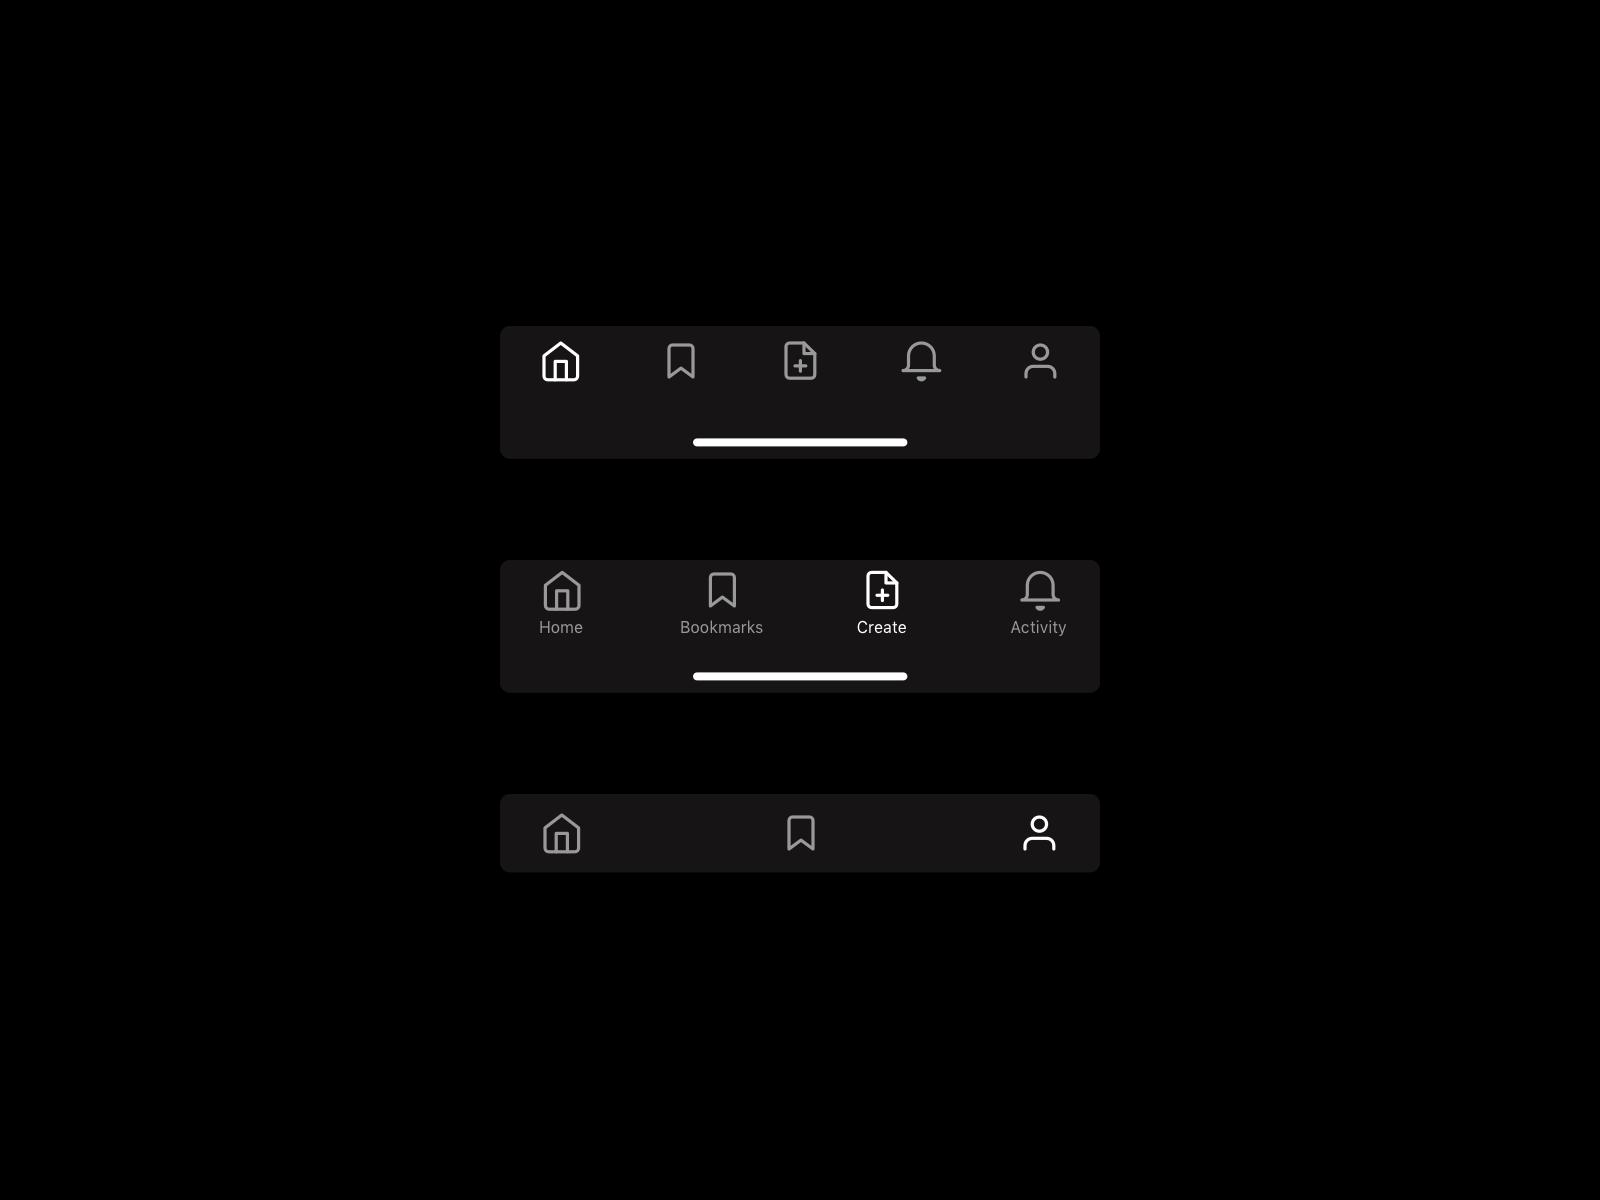 iOS Tab Bar